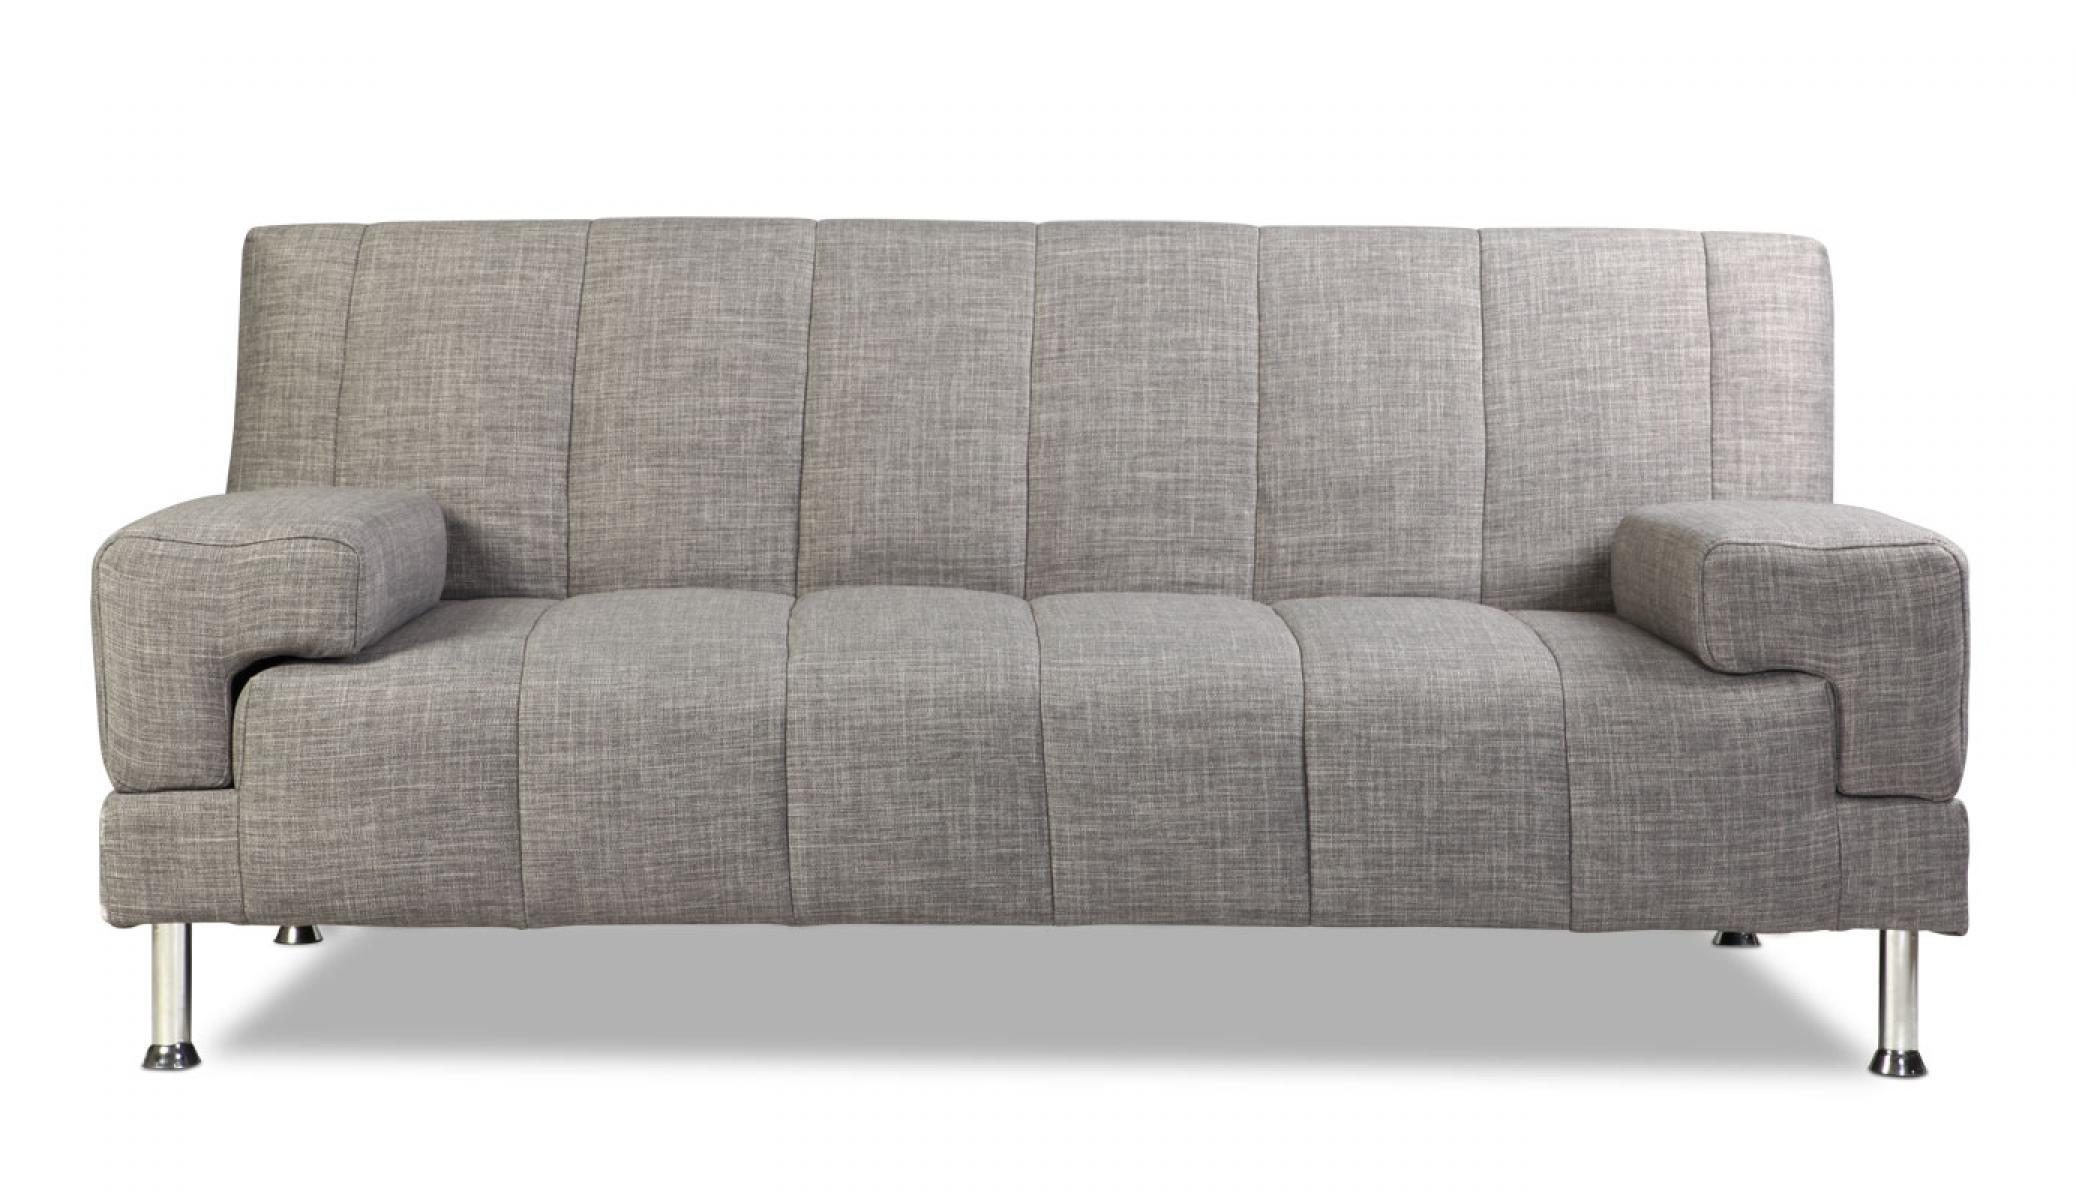 photos canap design convertible pas cher. Black Bedroom Furniture Sets. Home Design Ideas